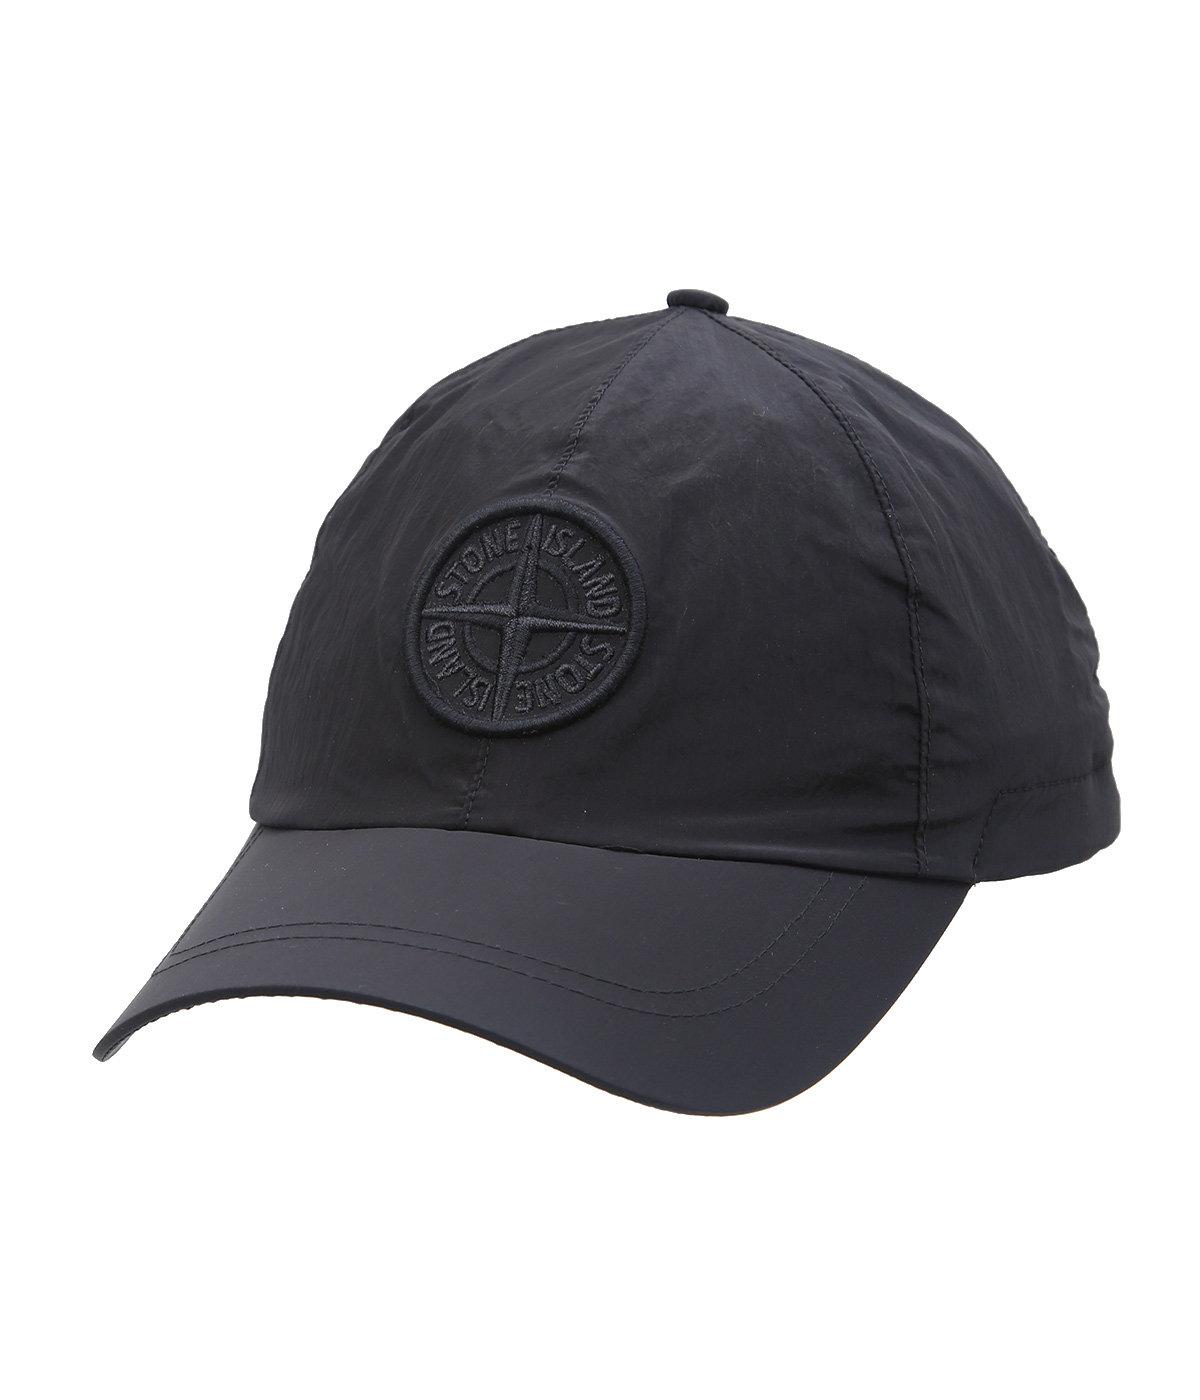 NYLON METAL LOGO CAP